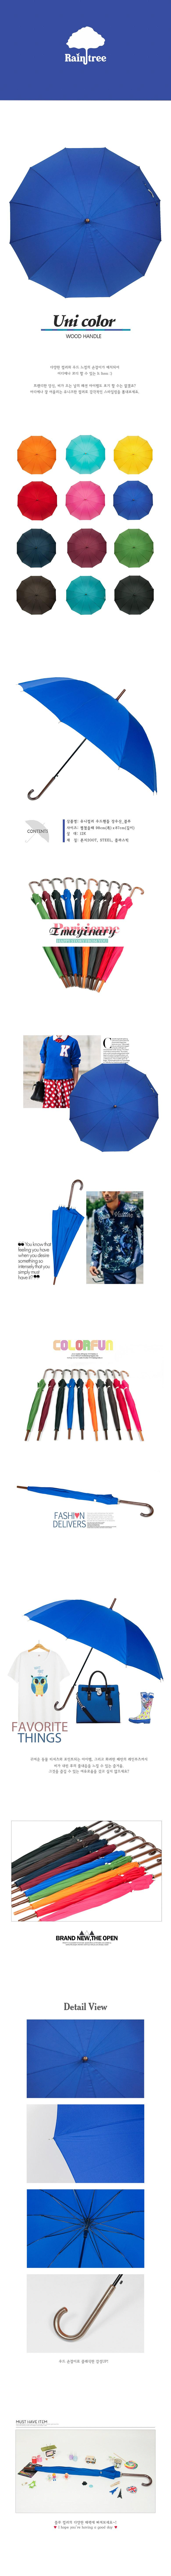 UNI COLOR WOOD HANDLE_BLUE 유니컬러 우드핸들_블루 (자동우산) - 레인트리, 22,000원, 우산, 자동장우산